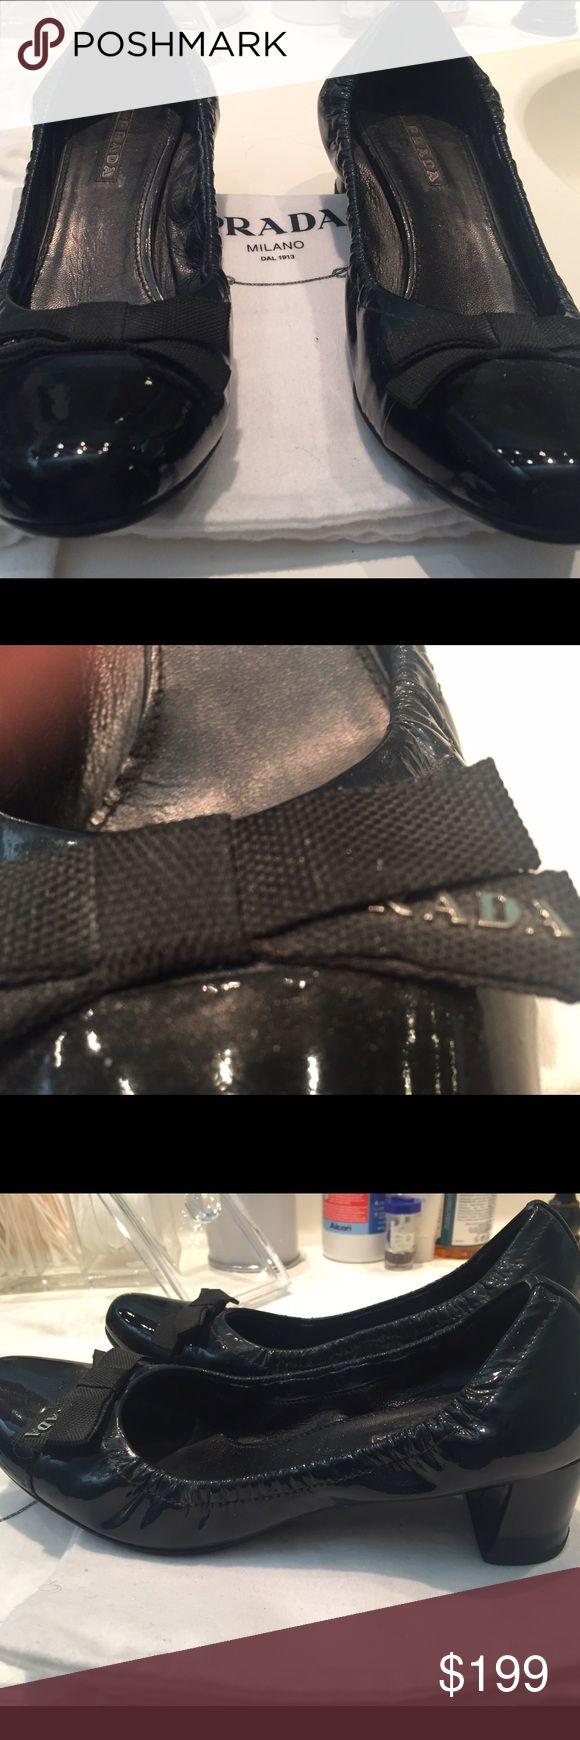 "PRADA Shoes-Dark Ink color (almost black) 1 1/2"" heel -comes with shoe dust covers Prada Shoes Heels"